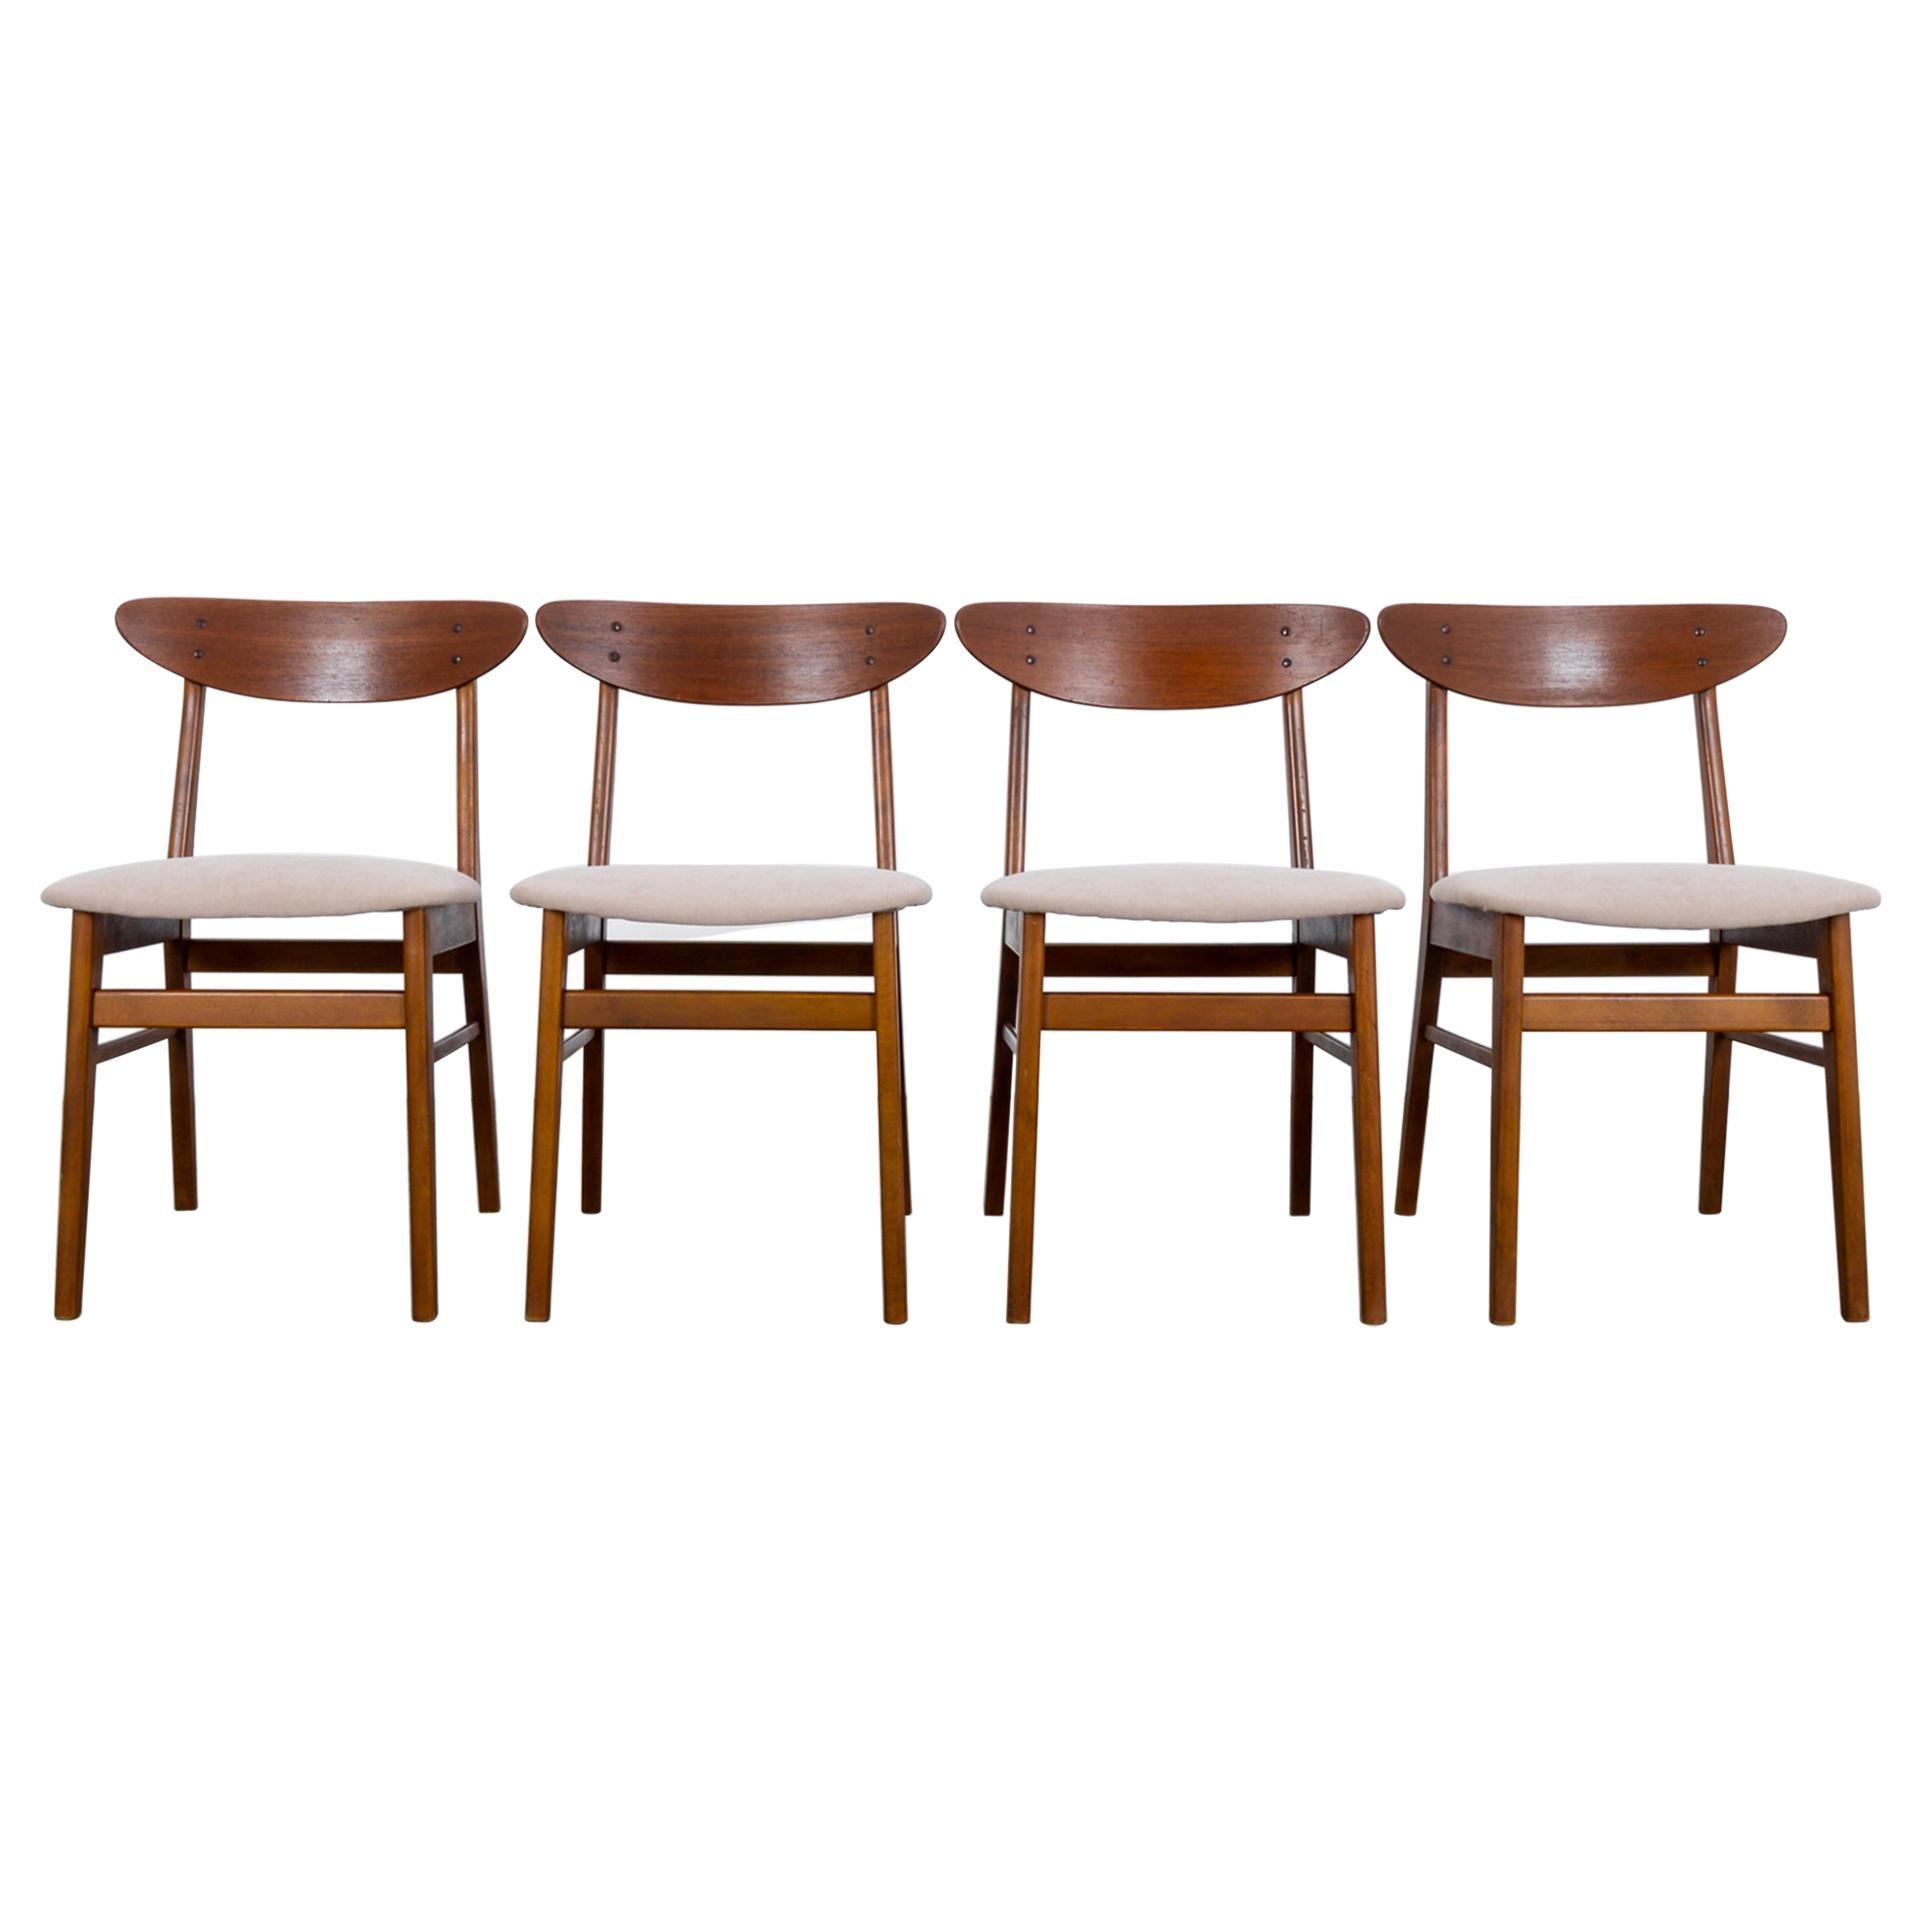 1960s Danish Upholstered Teak Chairs, Set of Four